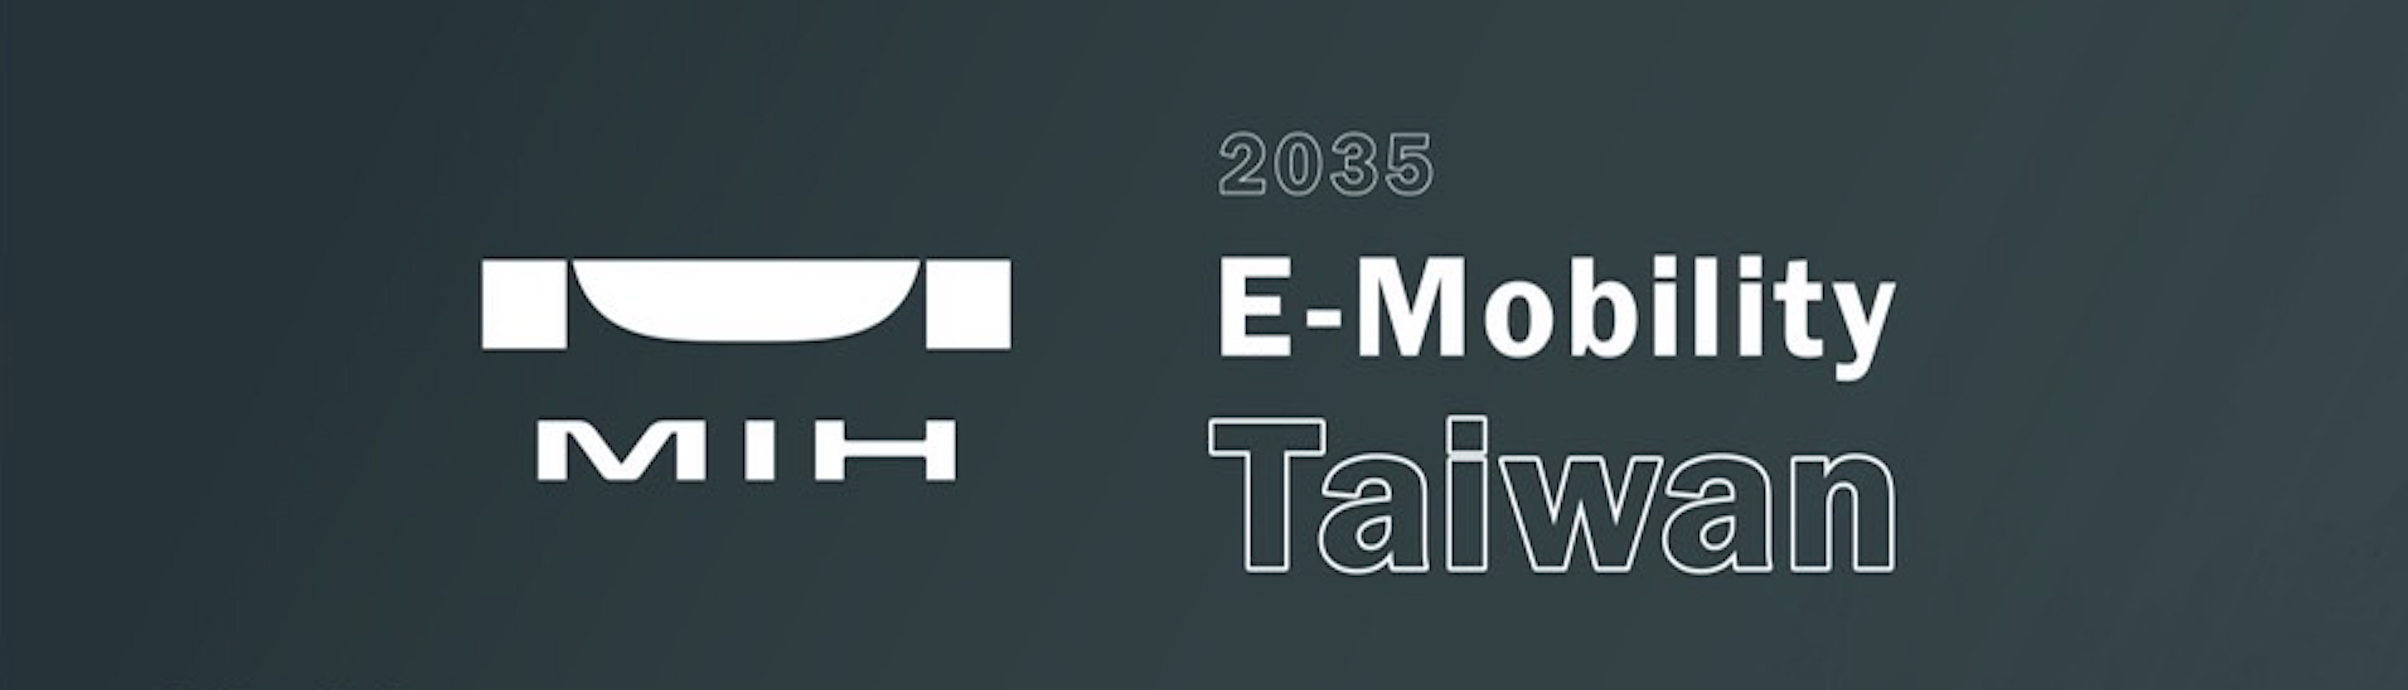 MIH 活動時間表 @ 2035 E-Mobility Taiwan